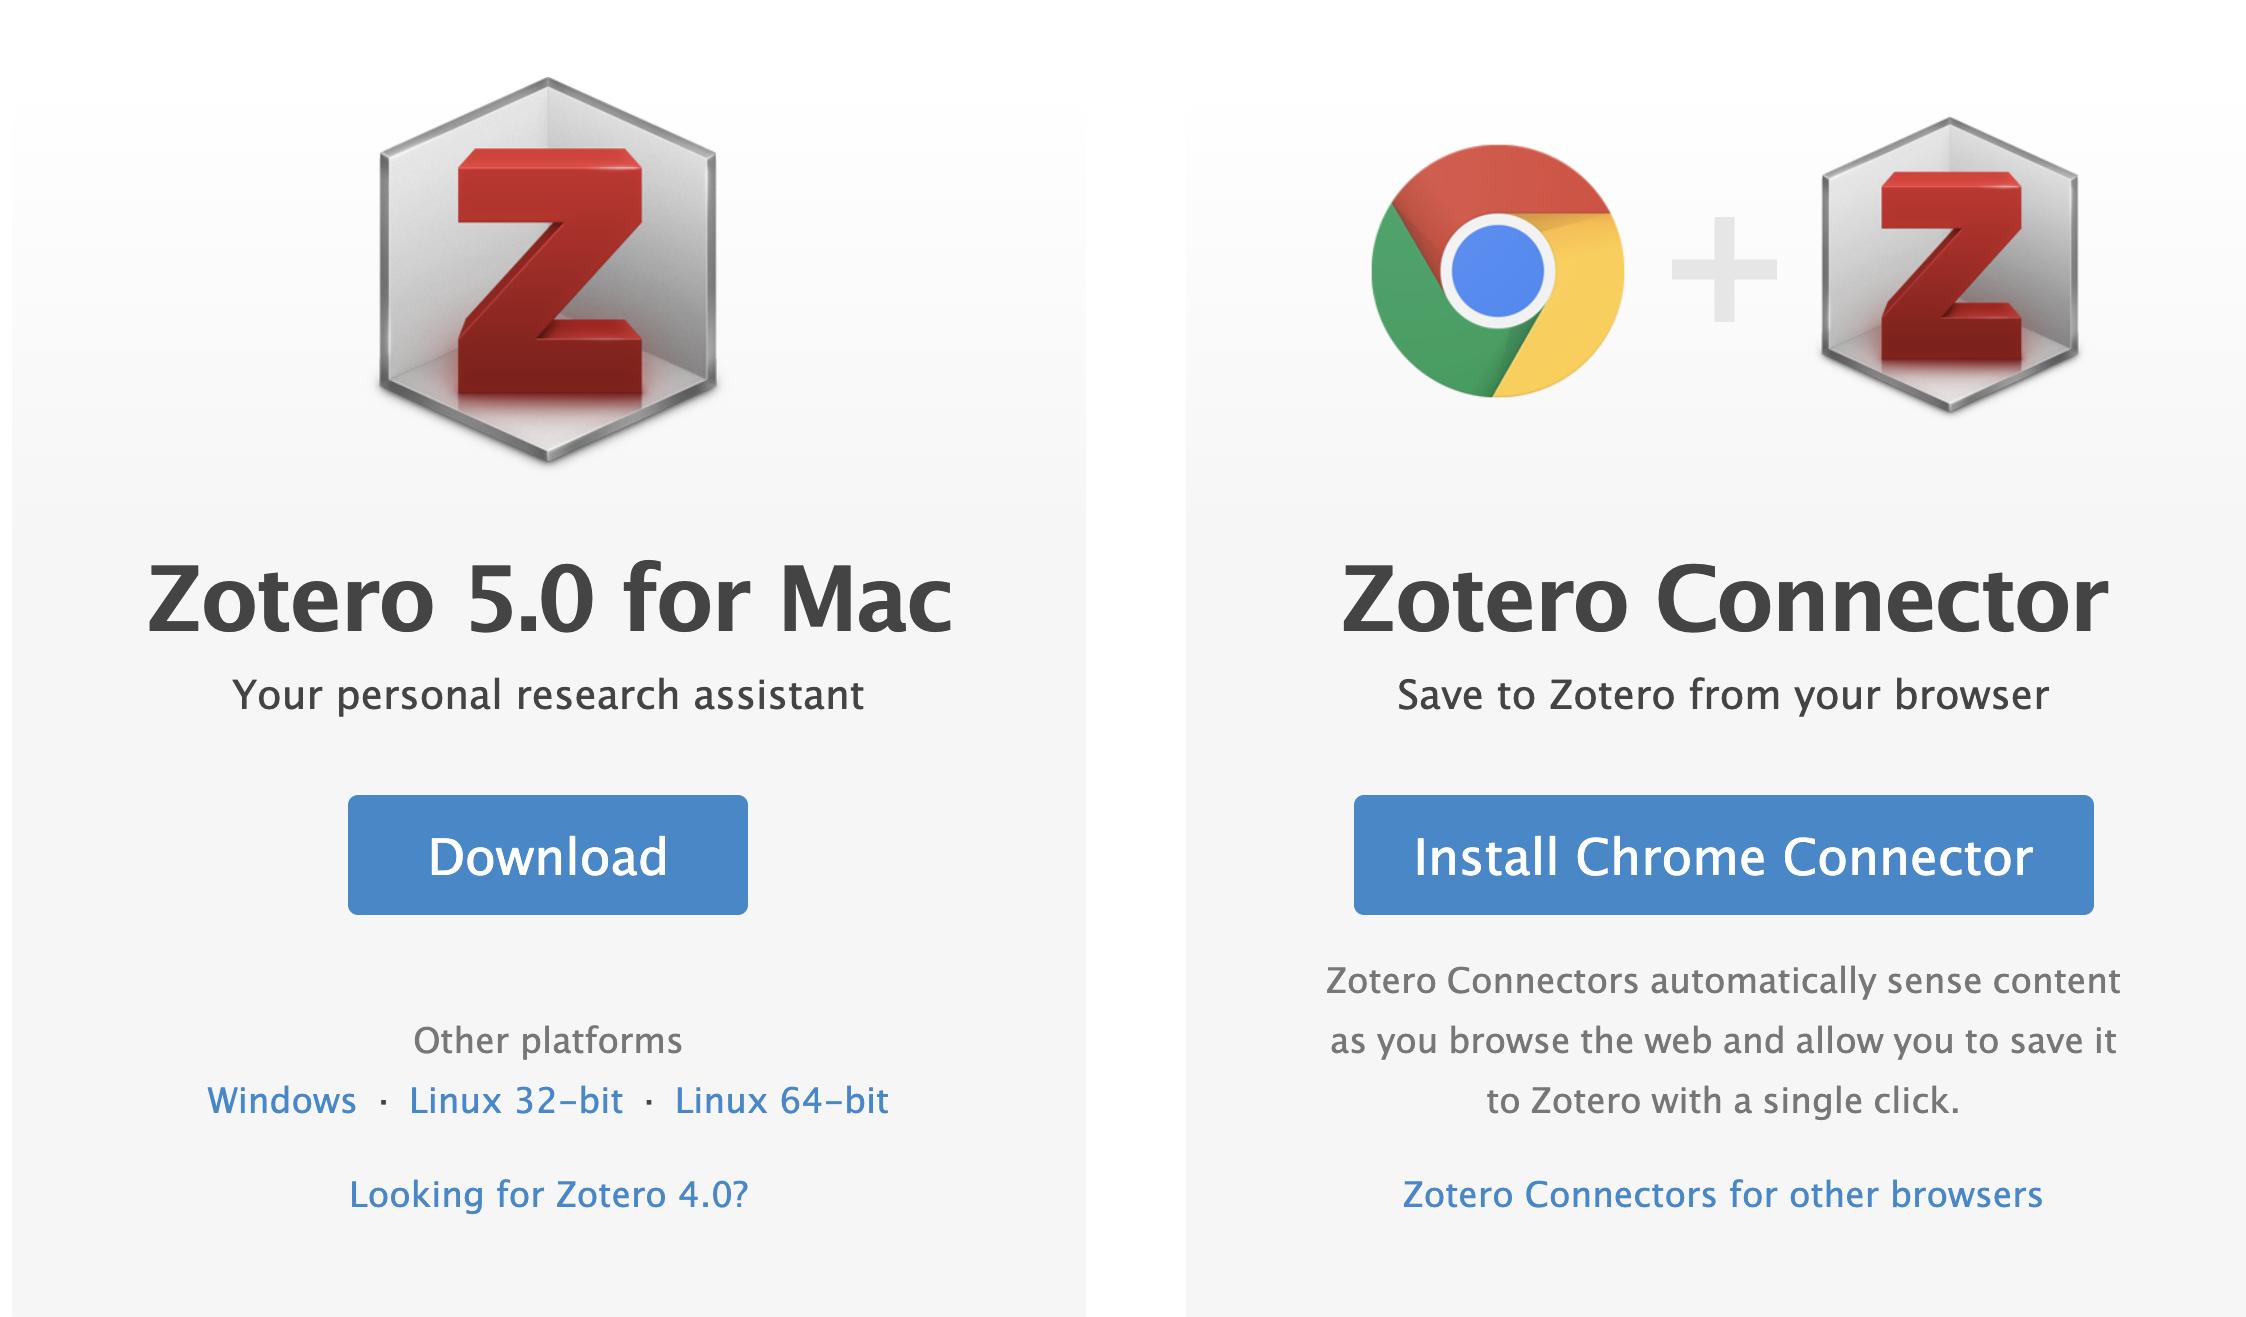 Zotero Connector Image